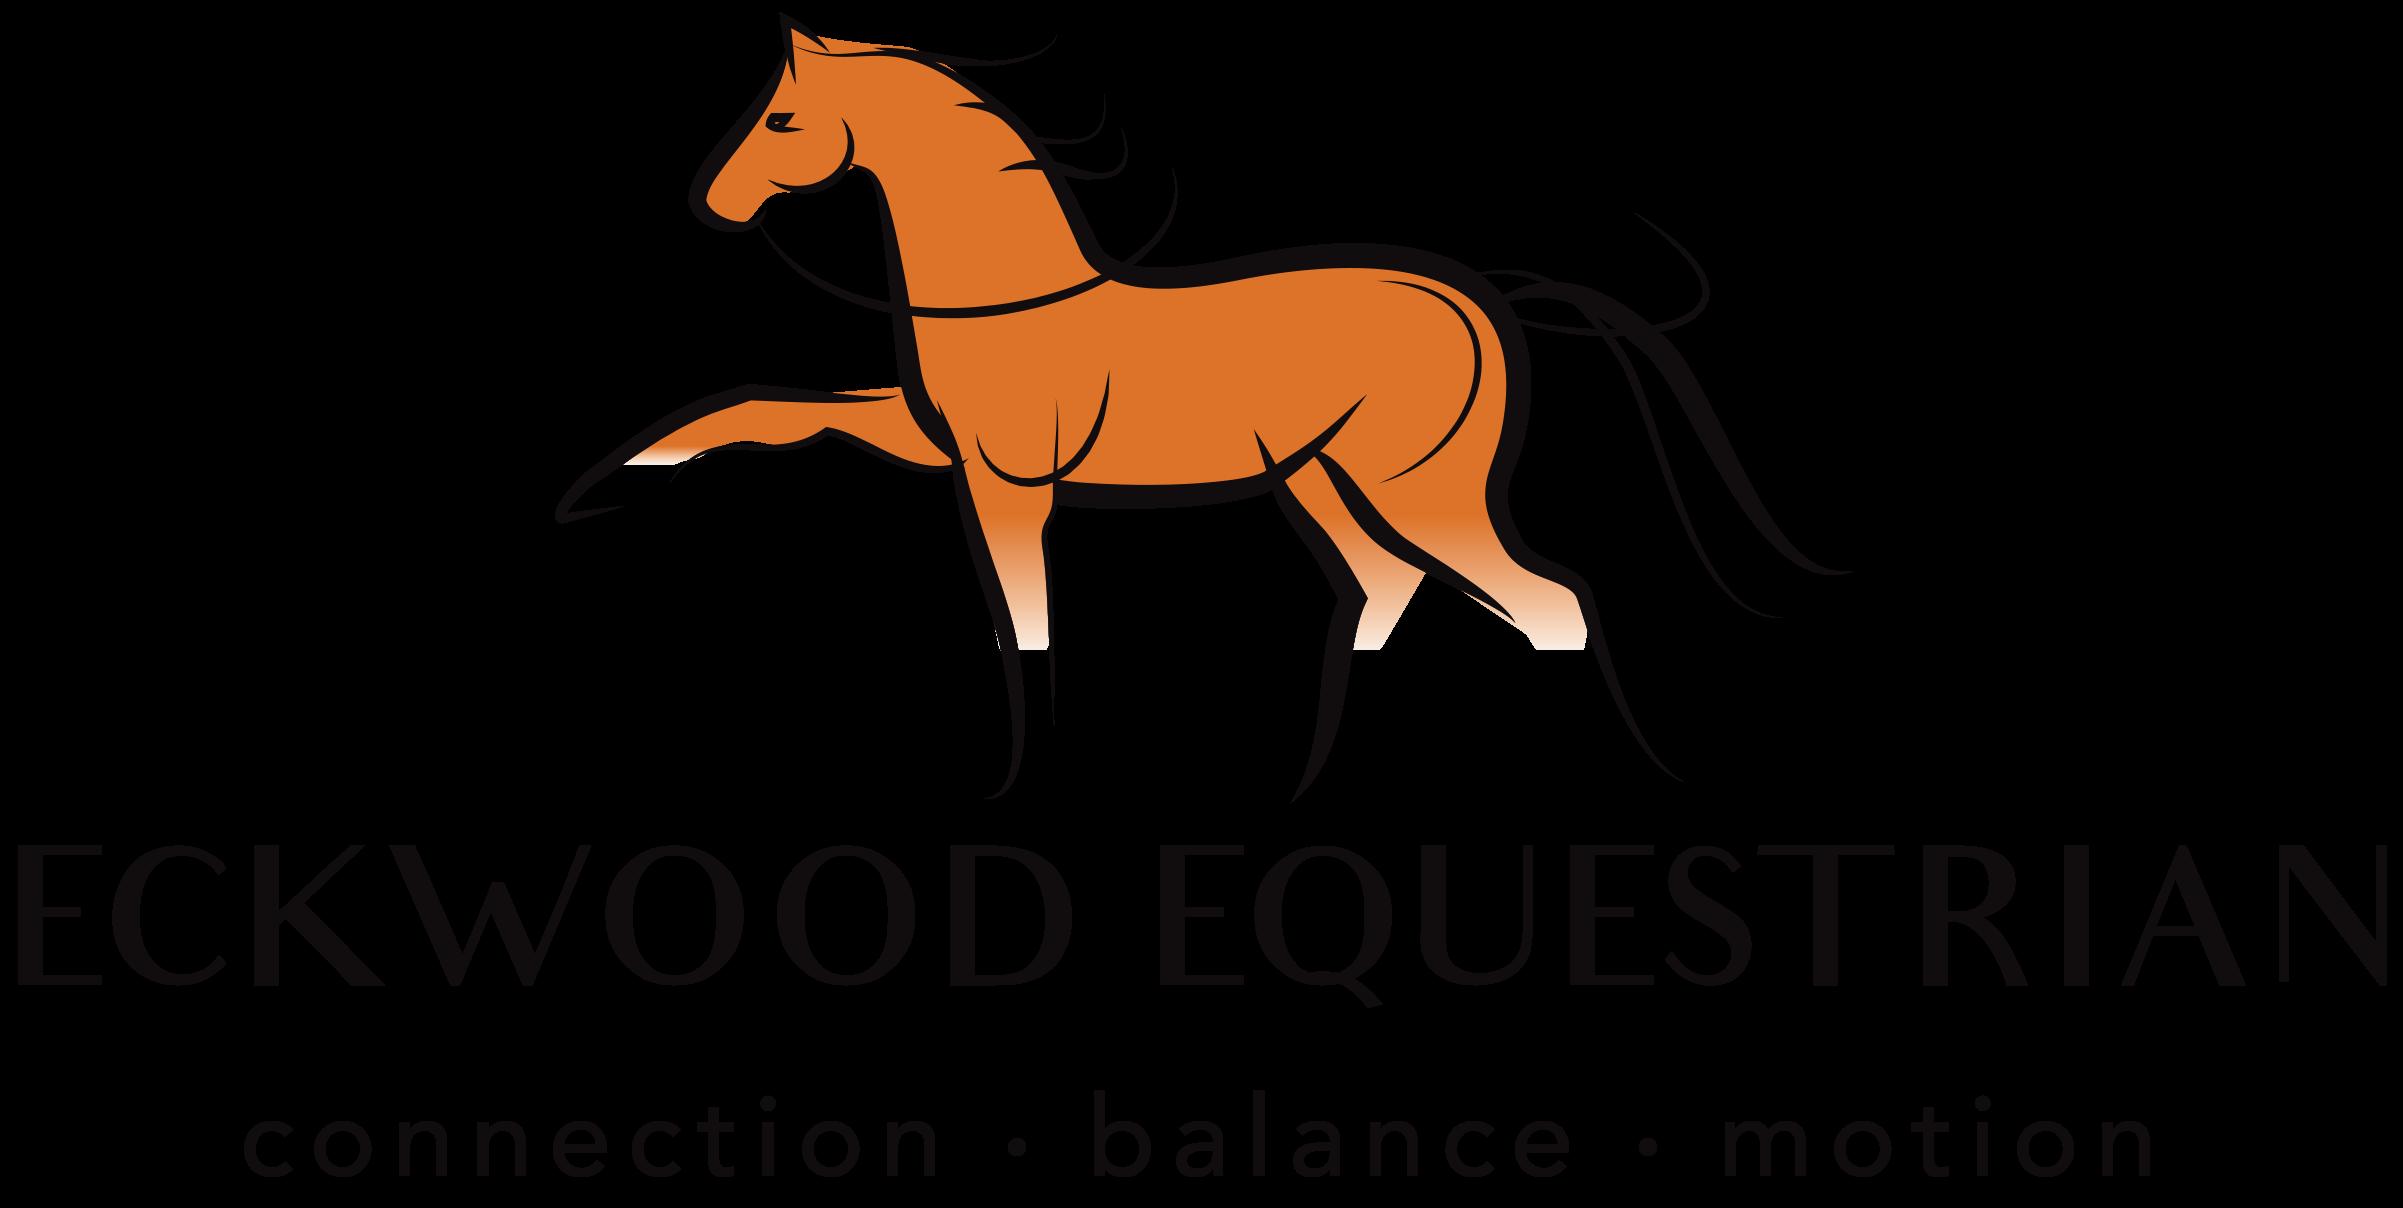 Eckwood Equestrian